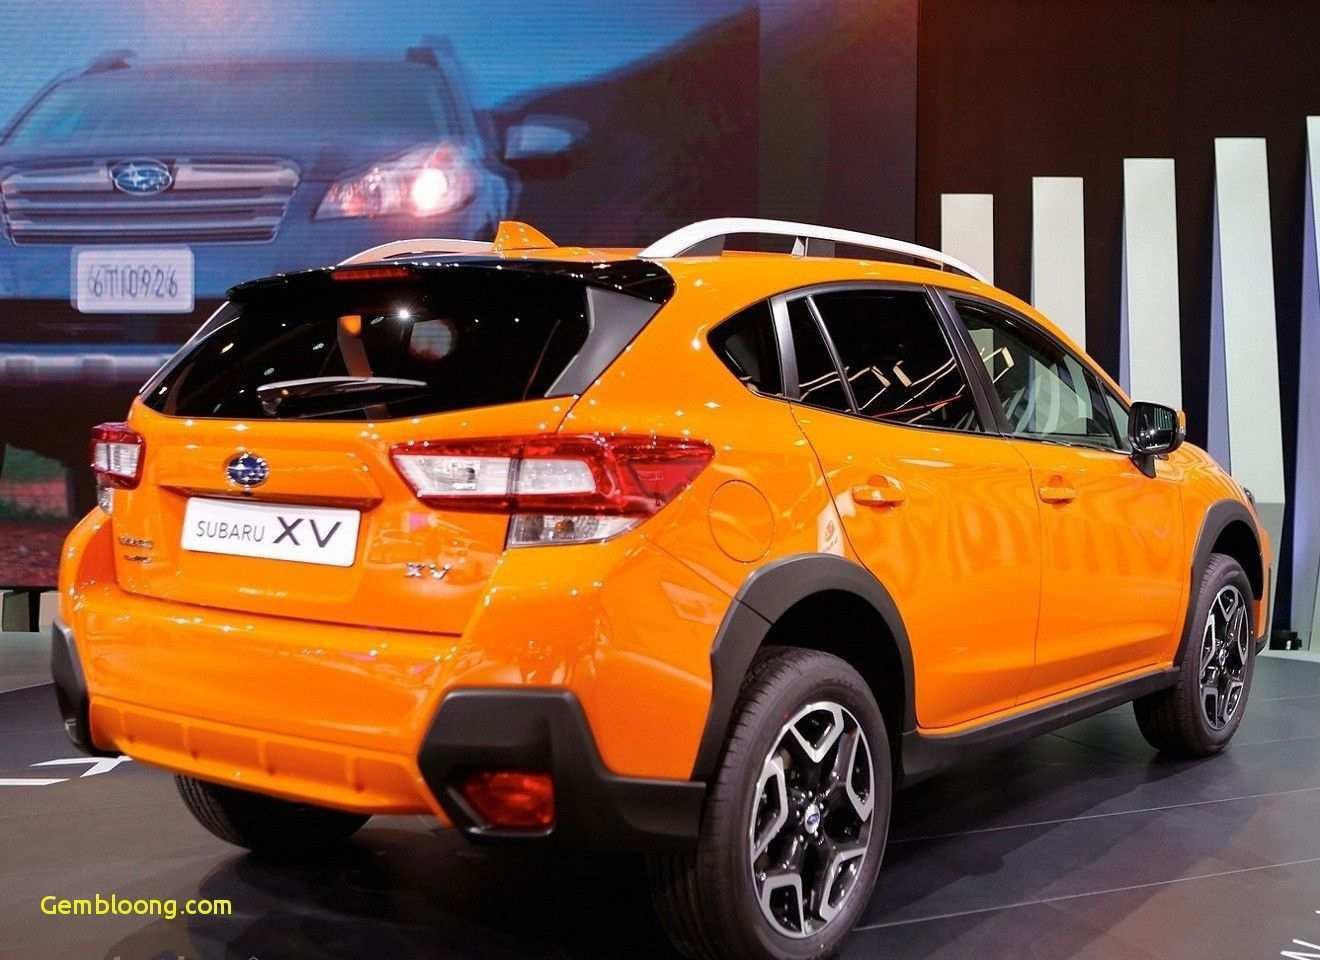 16 Gallery of Xv Subaru 2020 New Review for Xv Subaru 2020